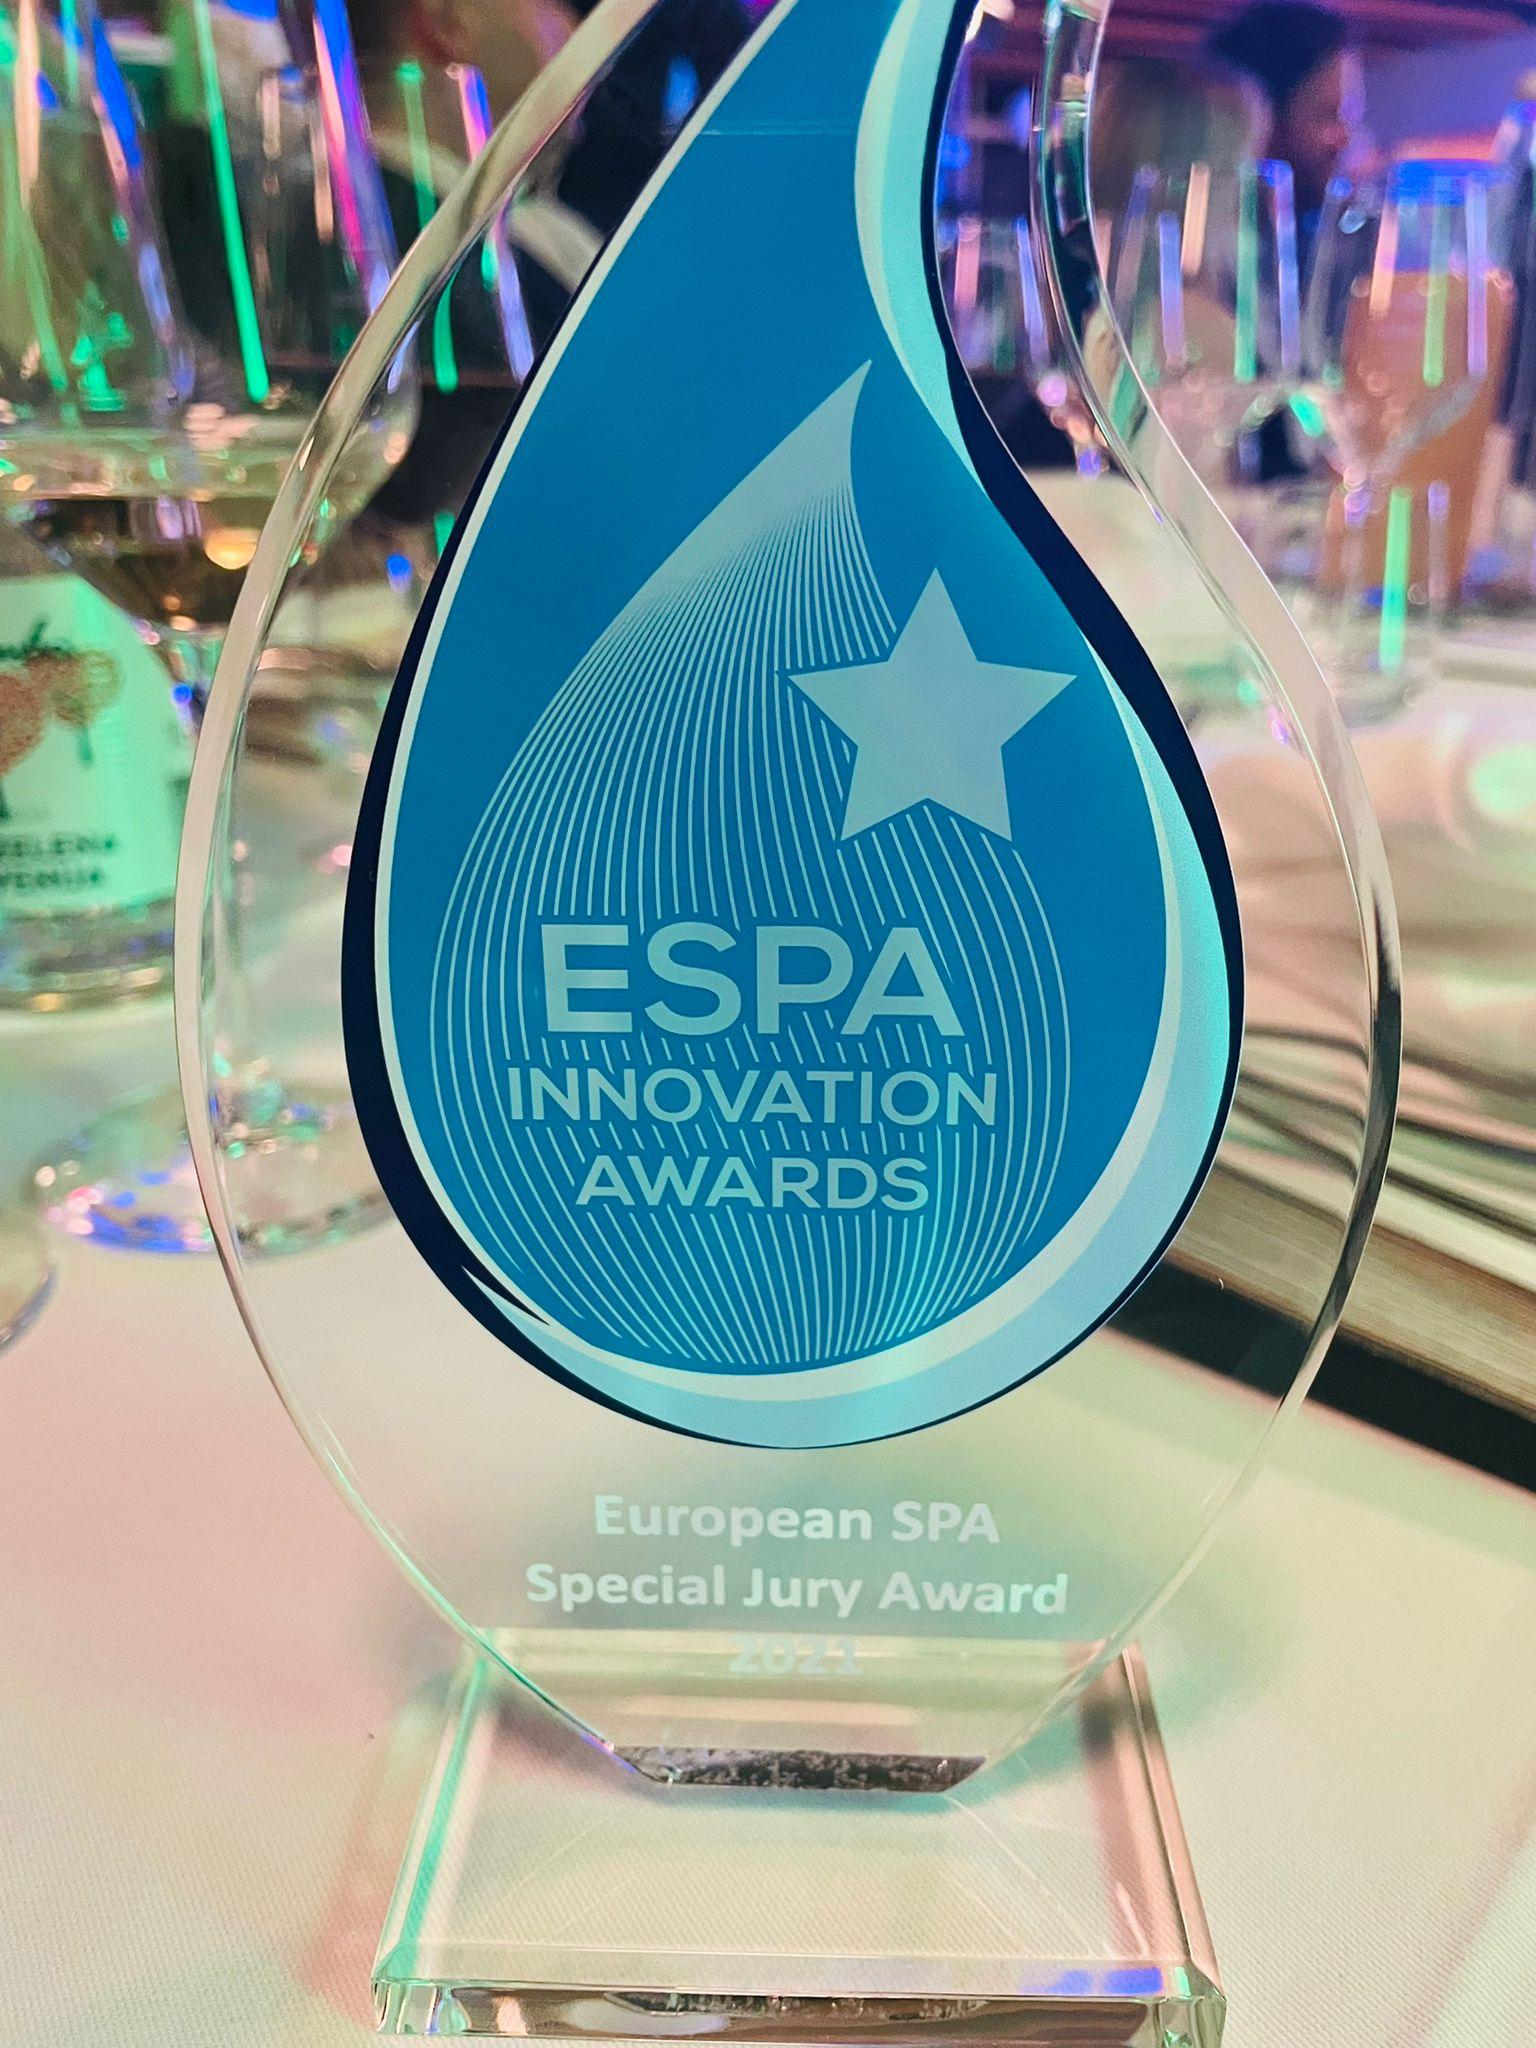 Ana Aslan Health Spa Eforie Nord câștigă un prestigios premiu al industriei SPA din Europa